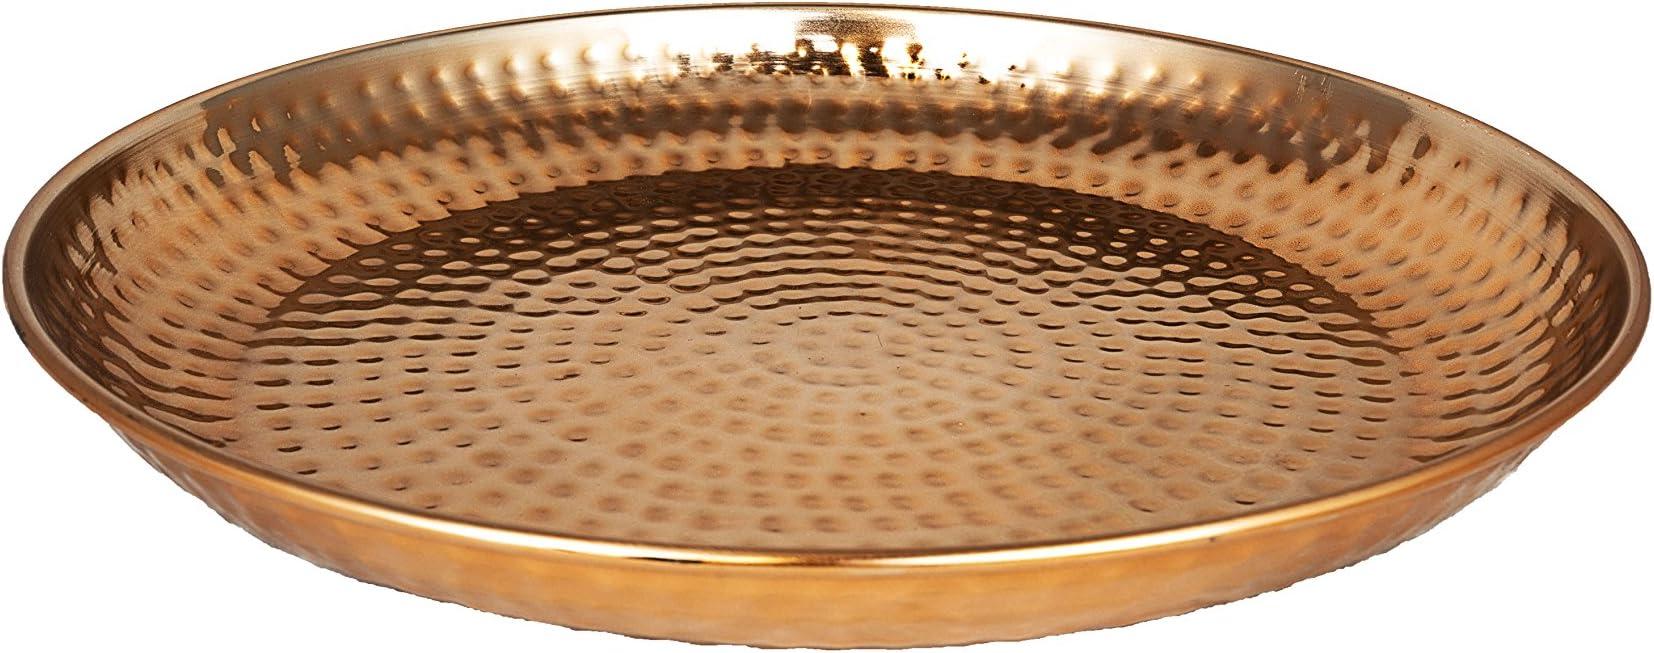 Marokkanischer Metall Deko Teller Schale Tablett Schwarz Orientalisch